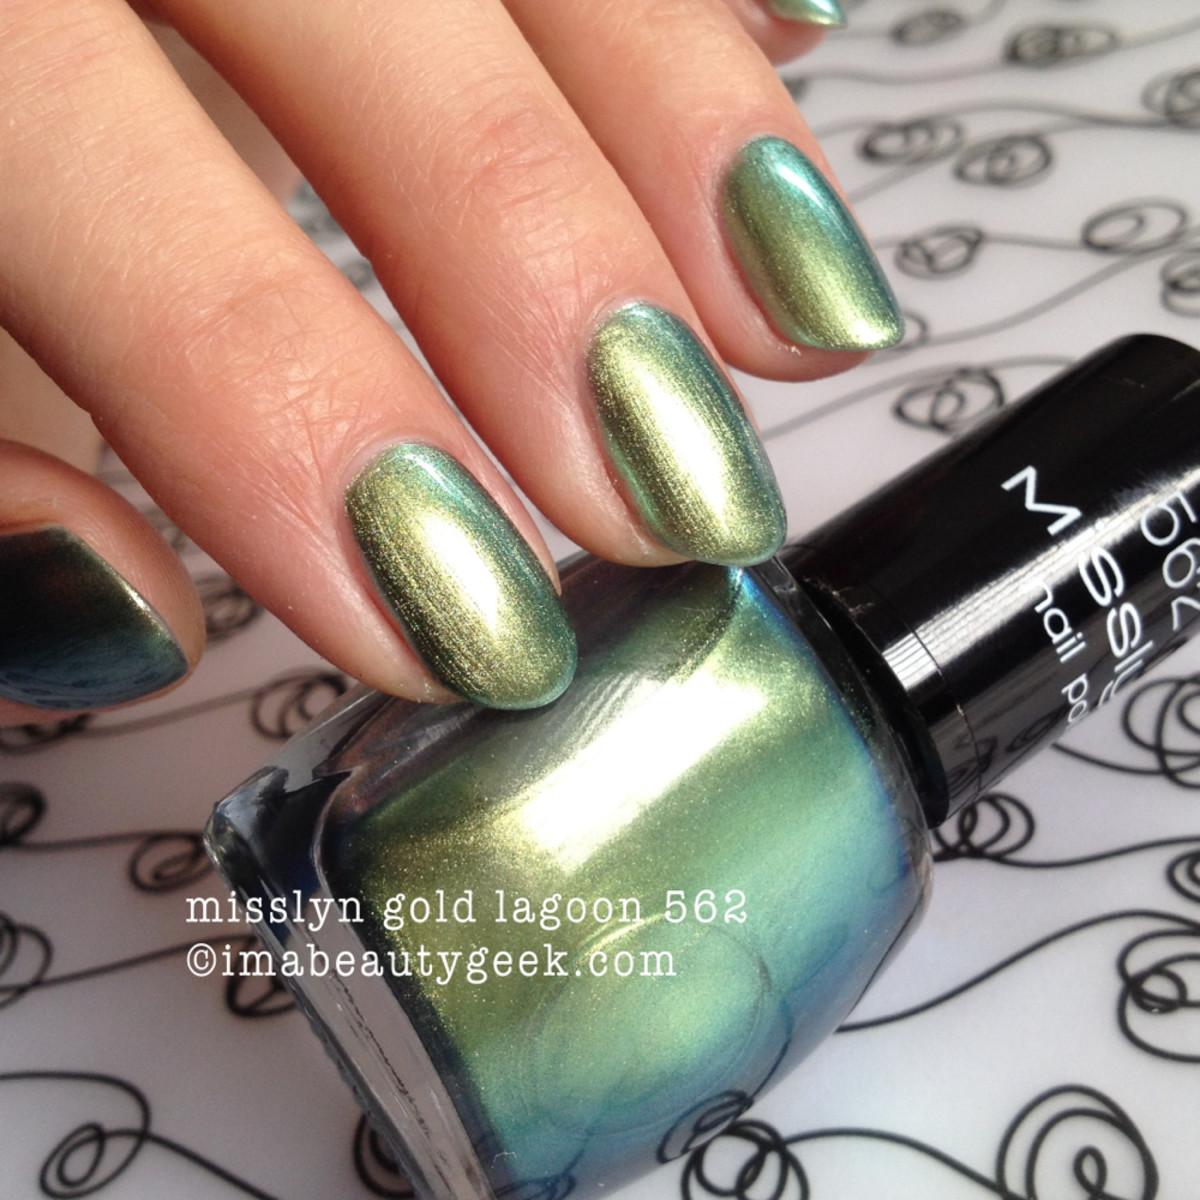 misslyn nail polish gold lagoon